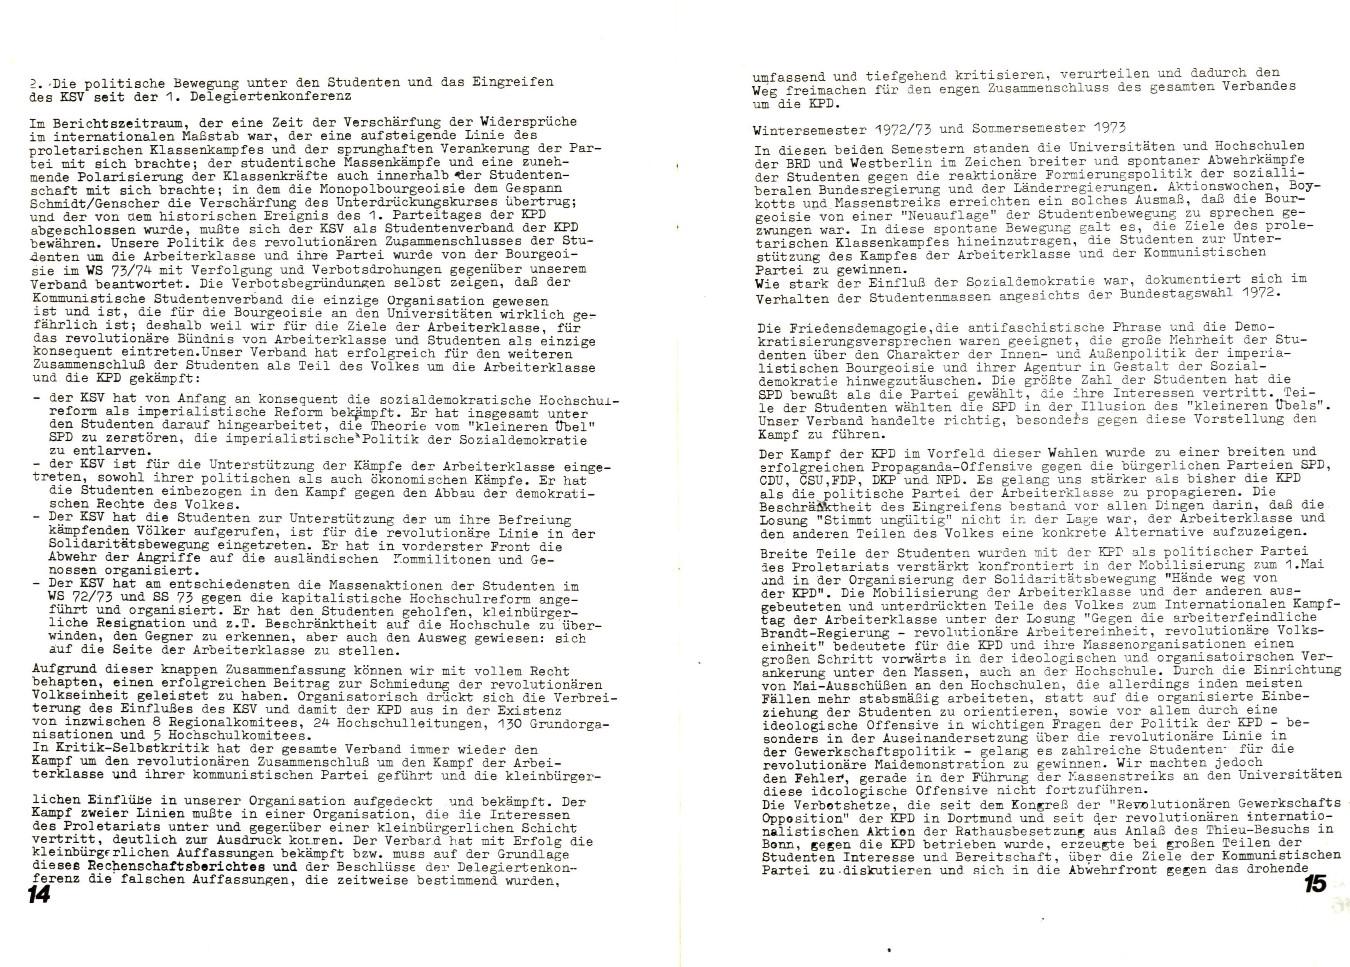 KSV_1974_Rechenschaftsbericht_09